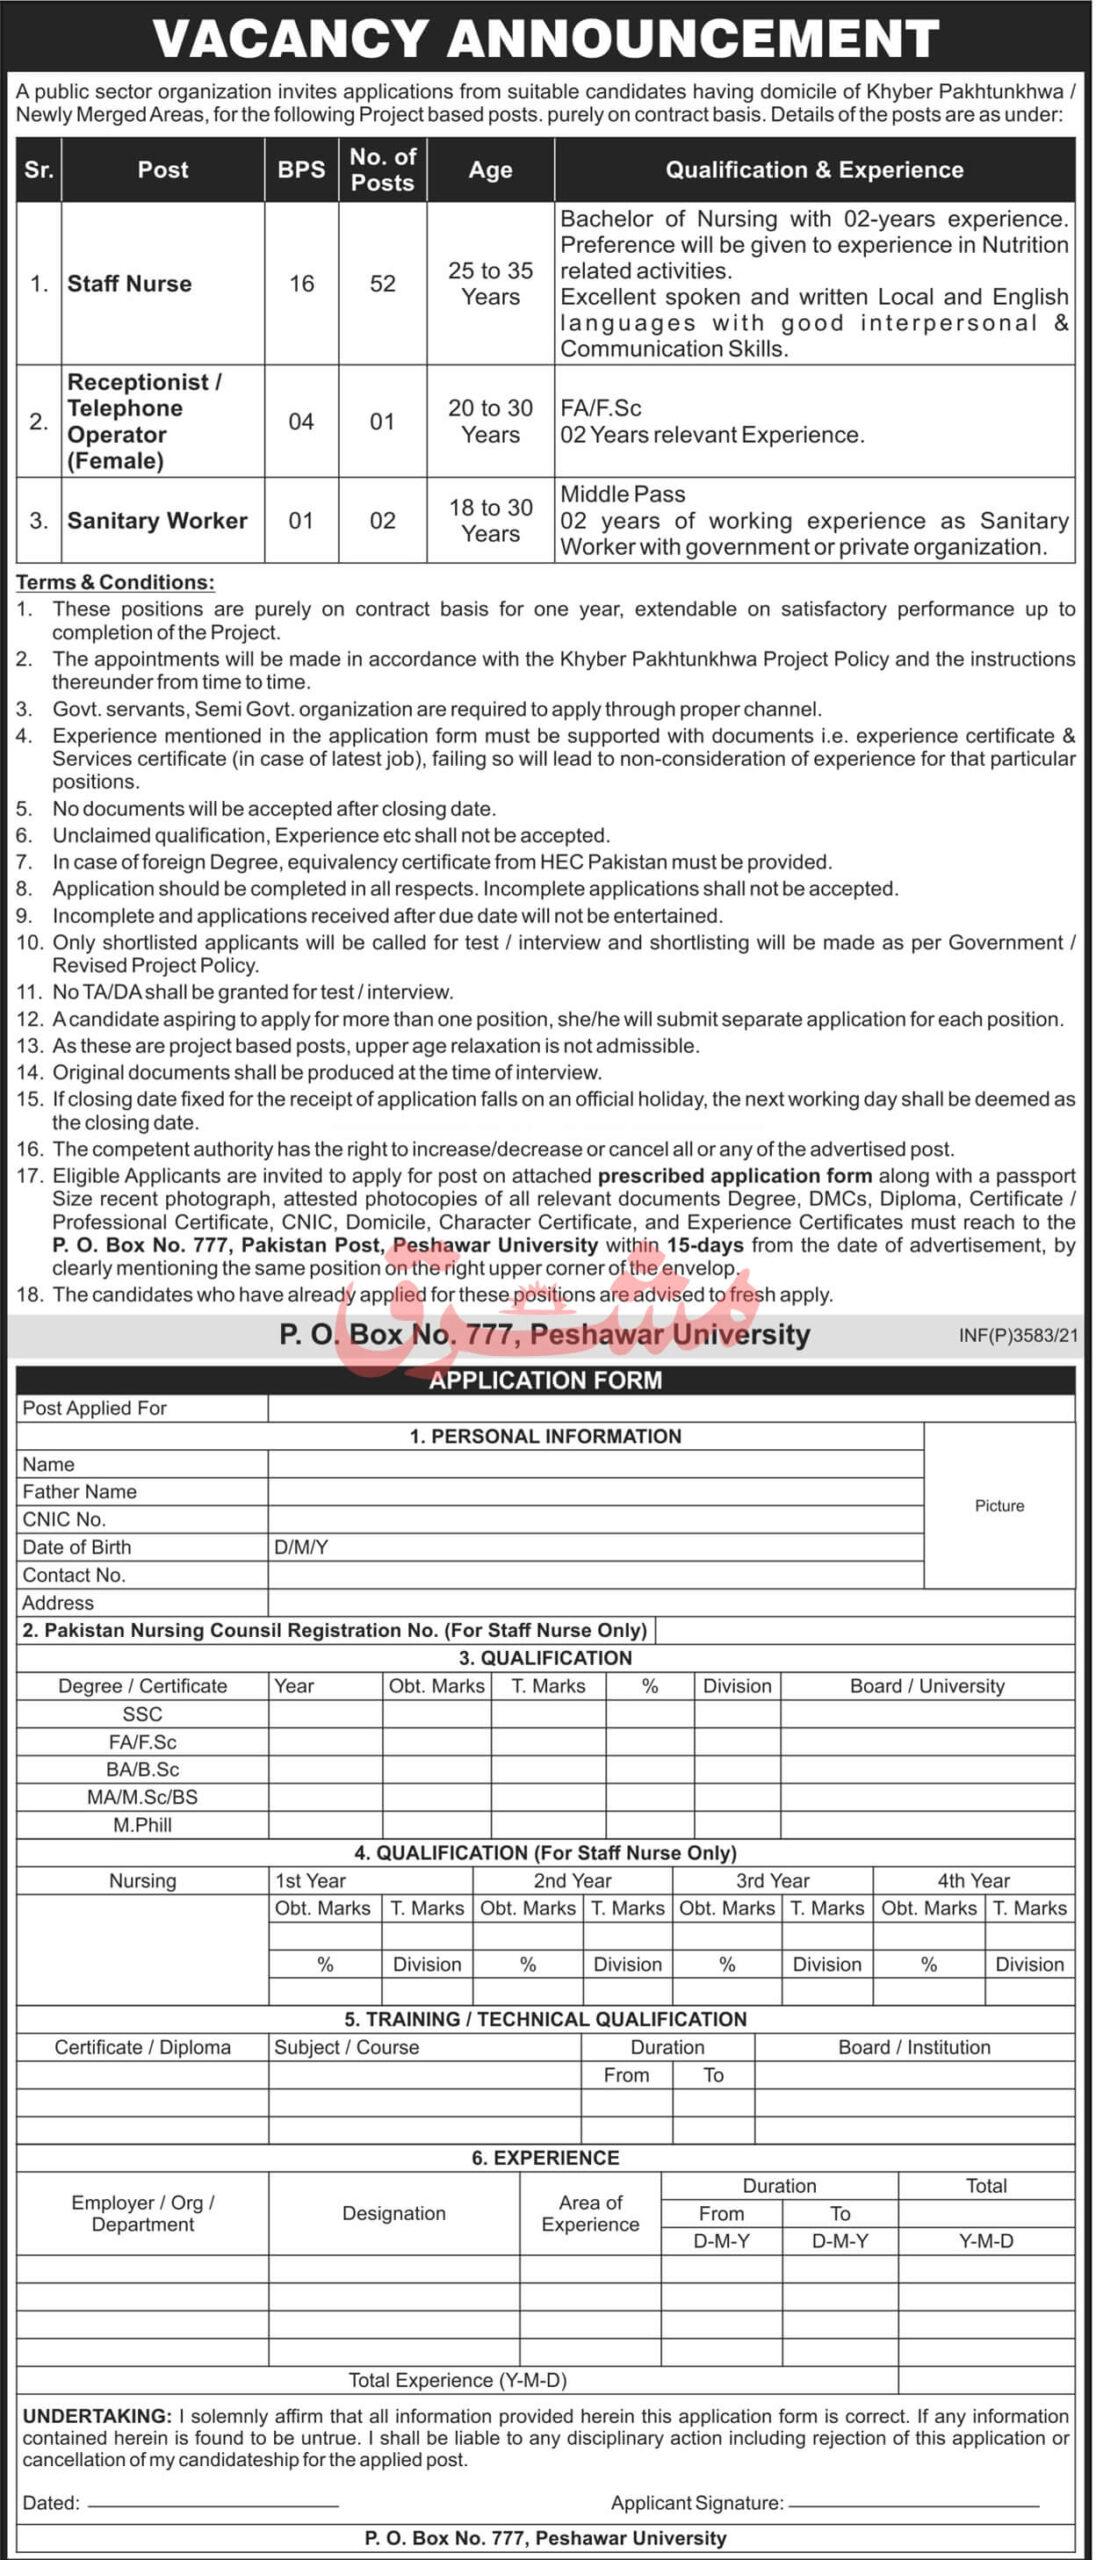 PO-Box-No-777-Peshawar-University-Jobs-2021-Advertisement-scaled